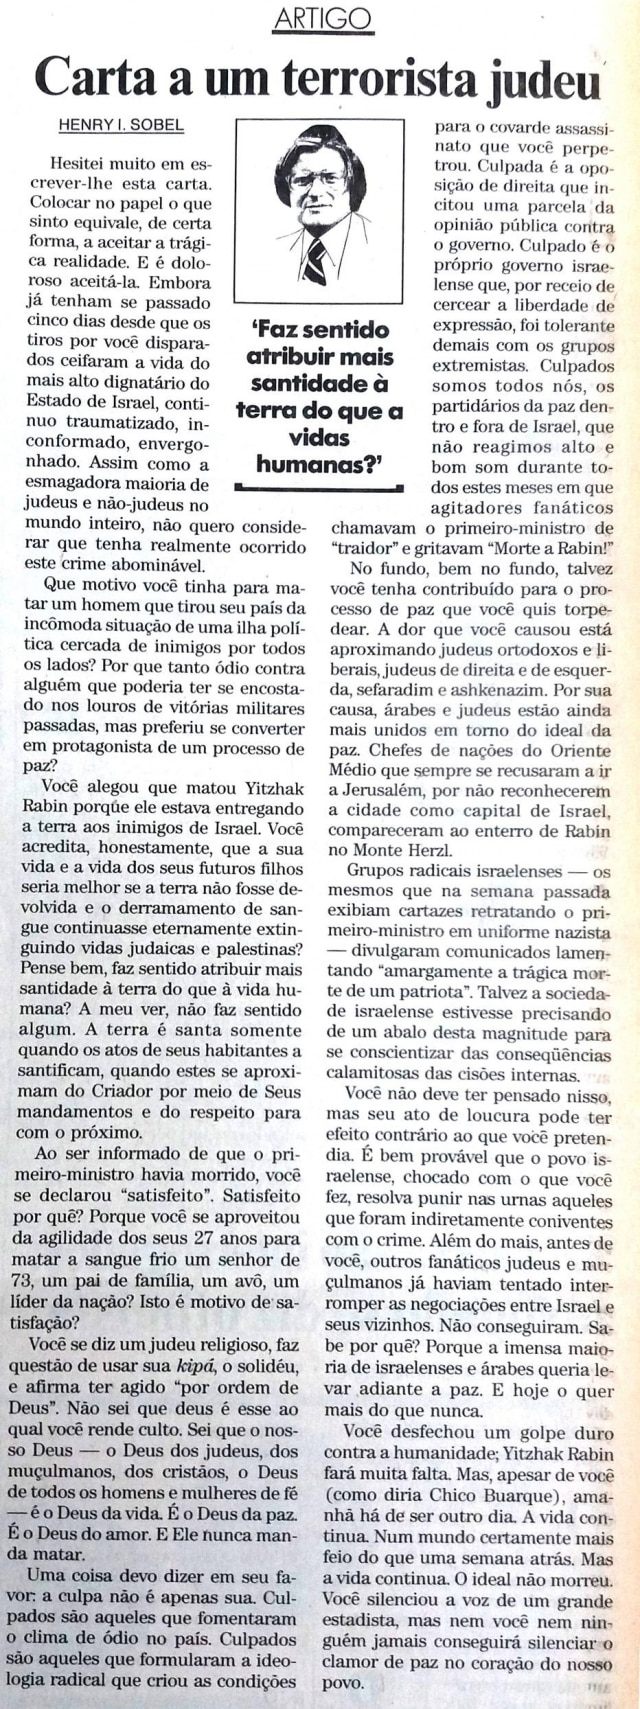 Texto deHenry Sobel sobre morte de Yitzhak Rabinem 1995.